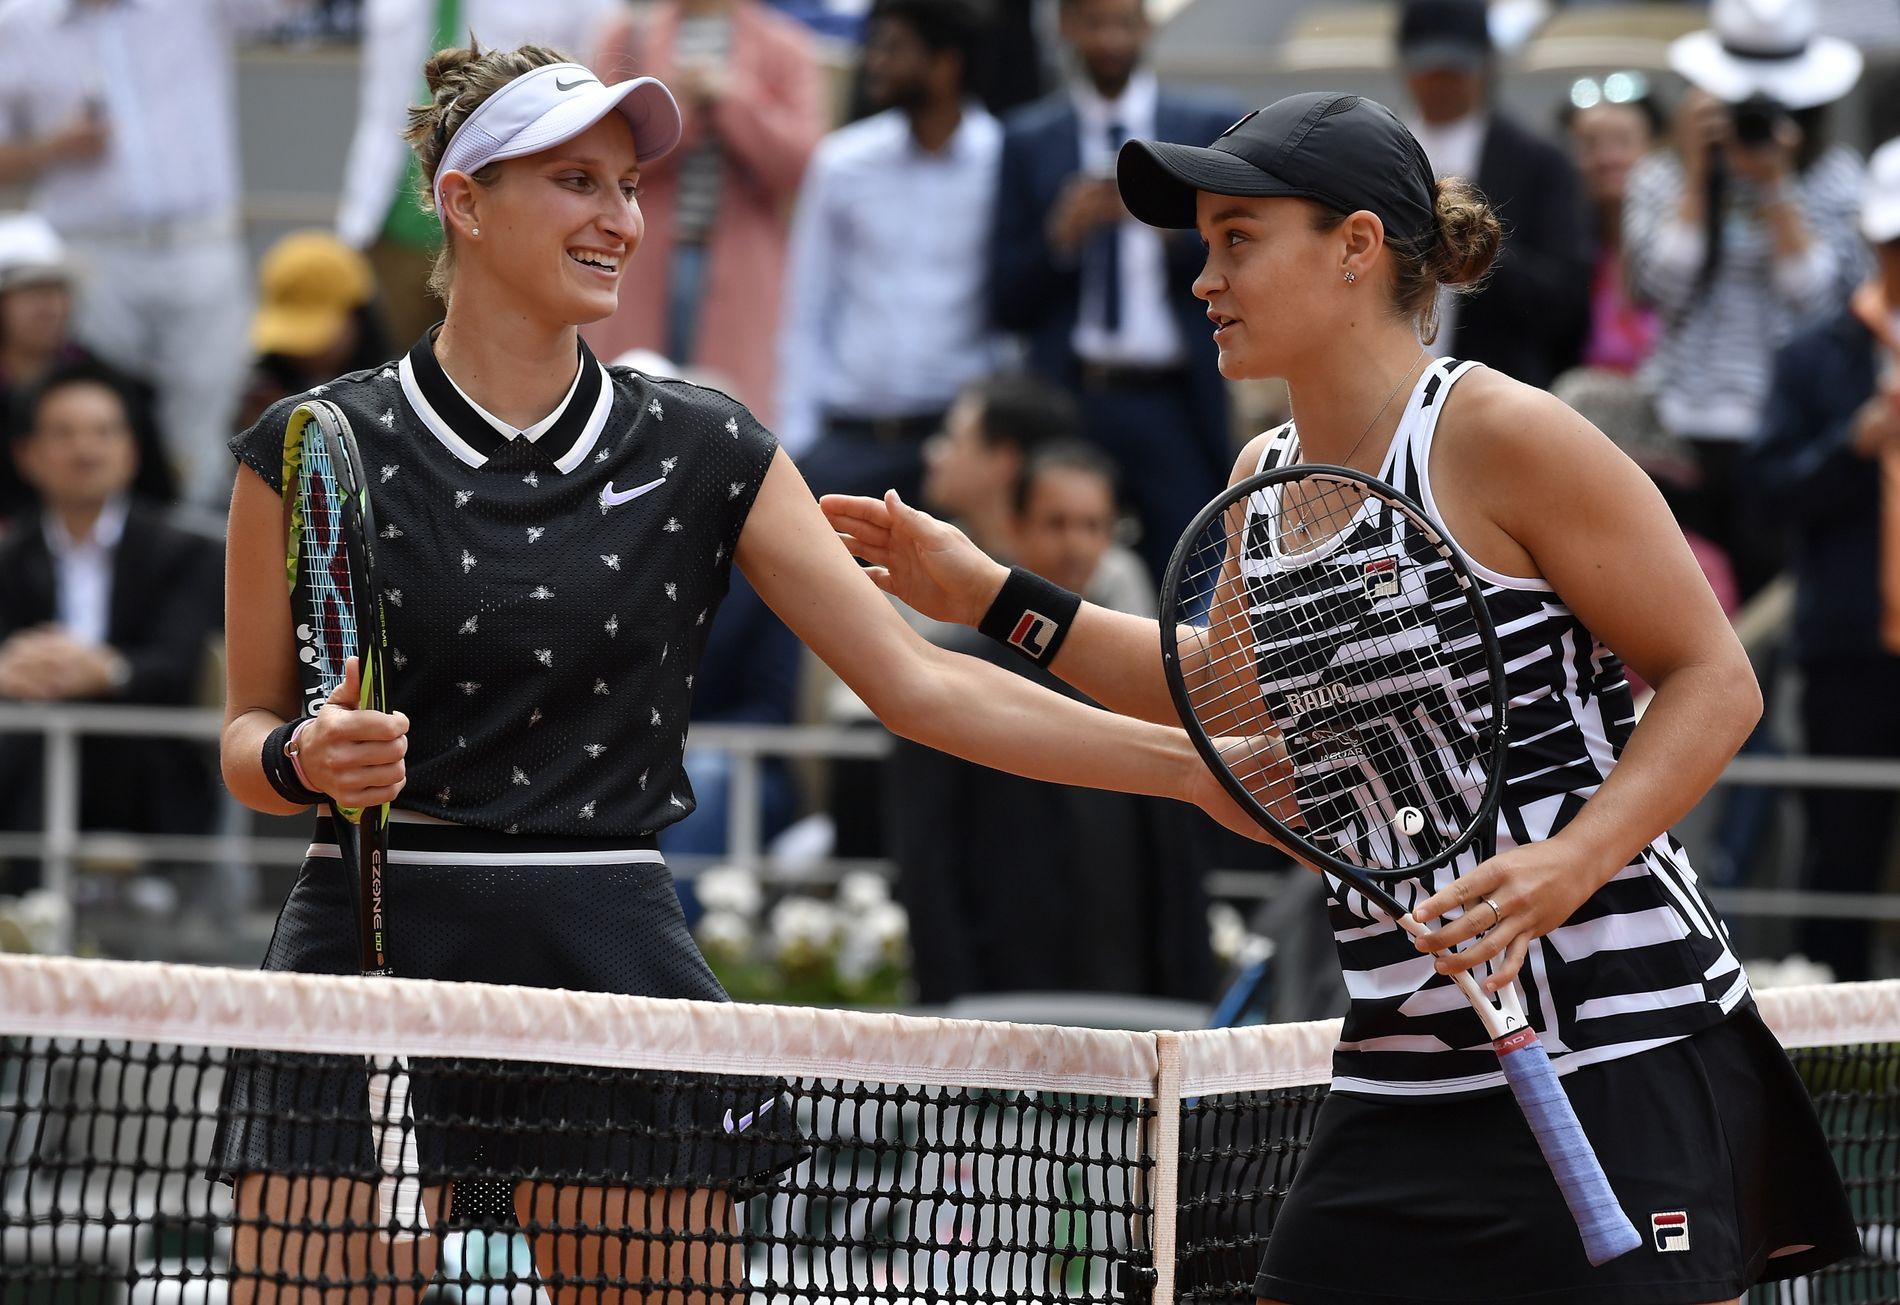 INGEN FAVORITTFINALE: Ashleigh Barty (t.h.)  Marketa Vondrousova spilte finale i Paris, Barty vant enkelt.